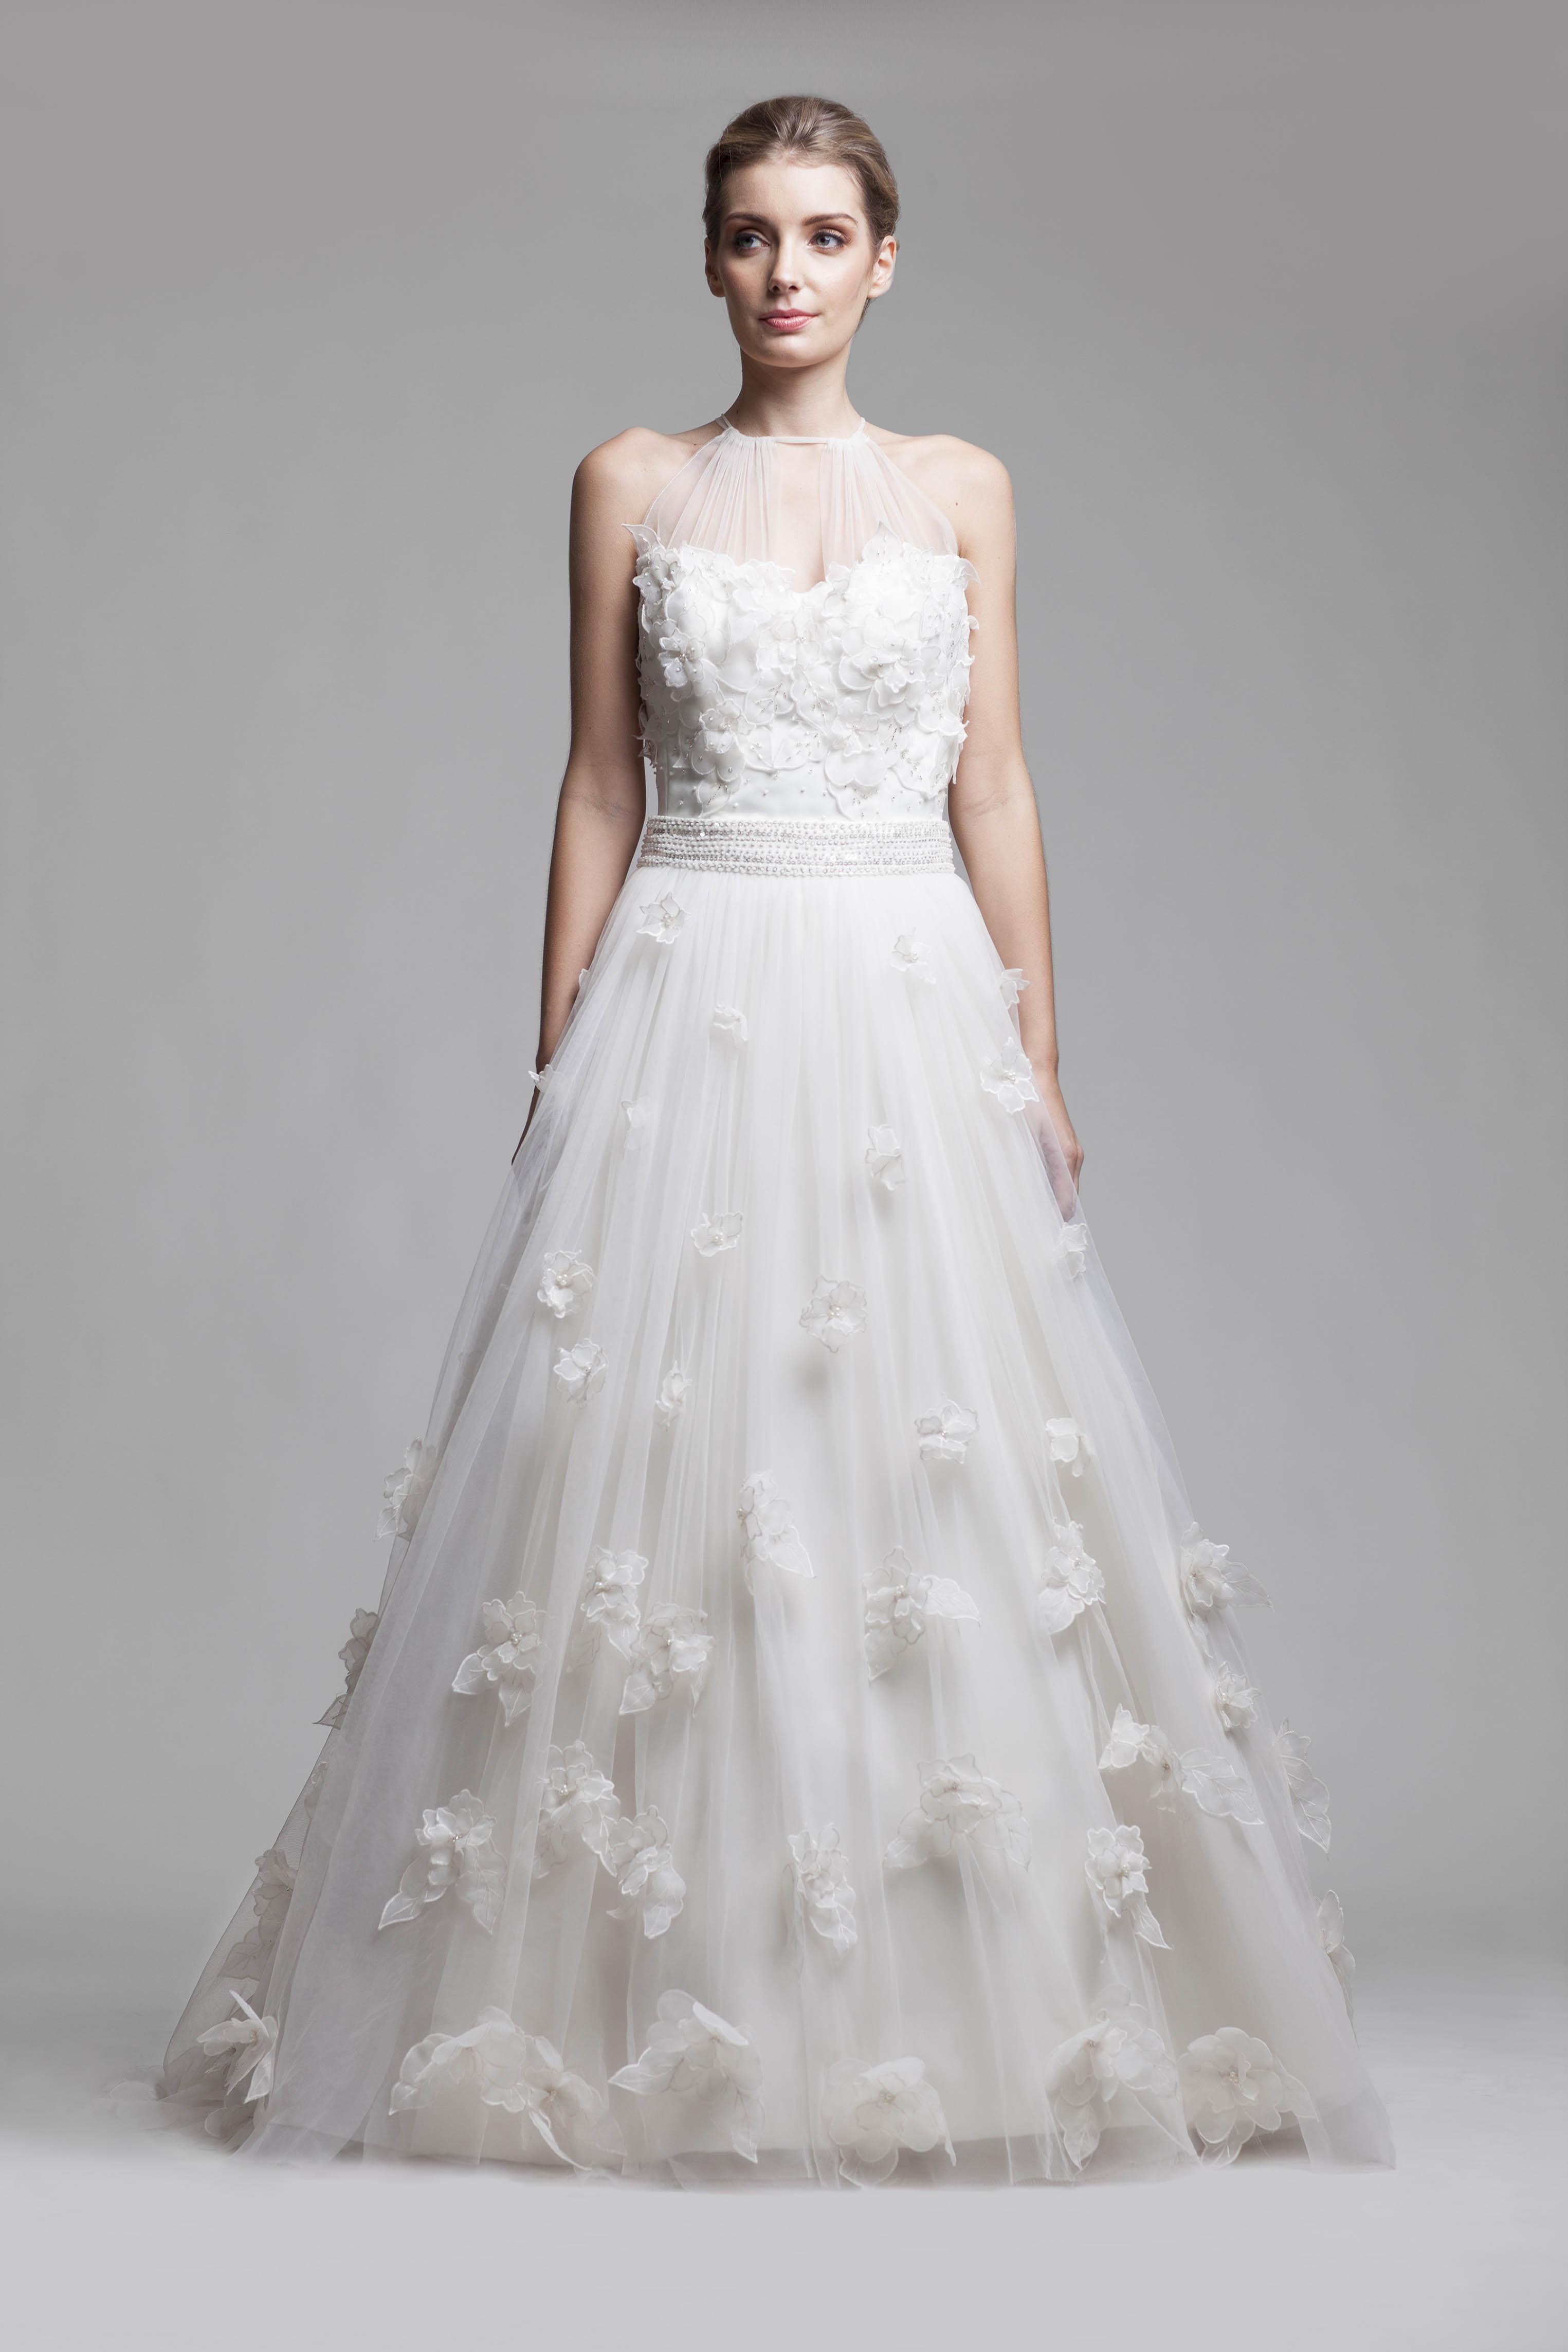 2015 Fleur Collection – Camille Garcia Bridal Couture